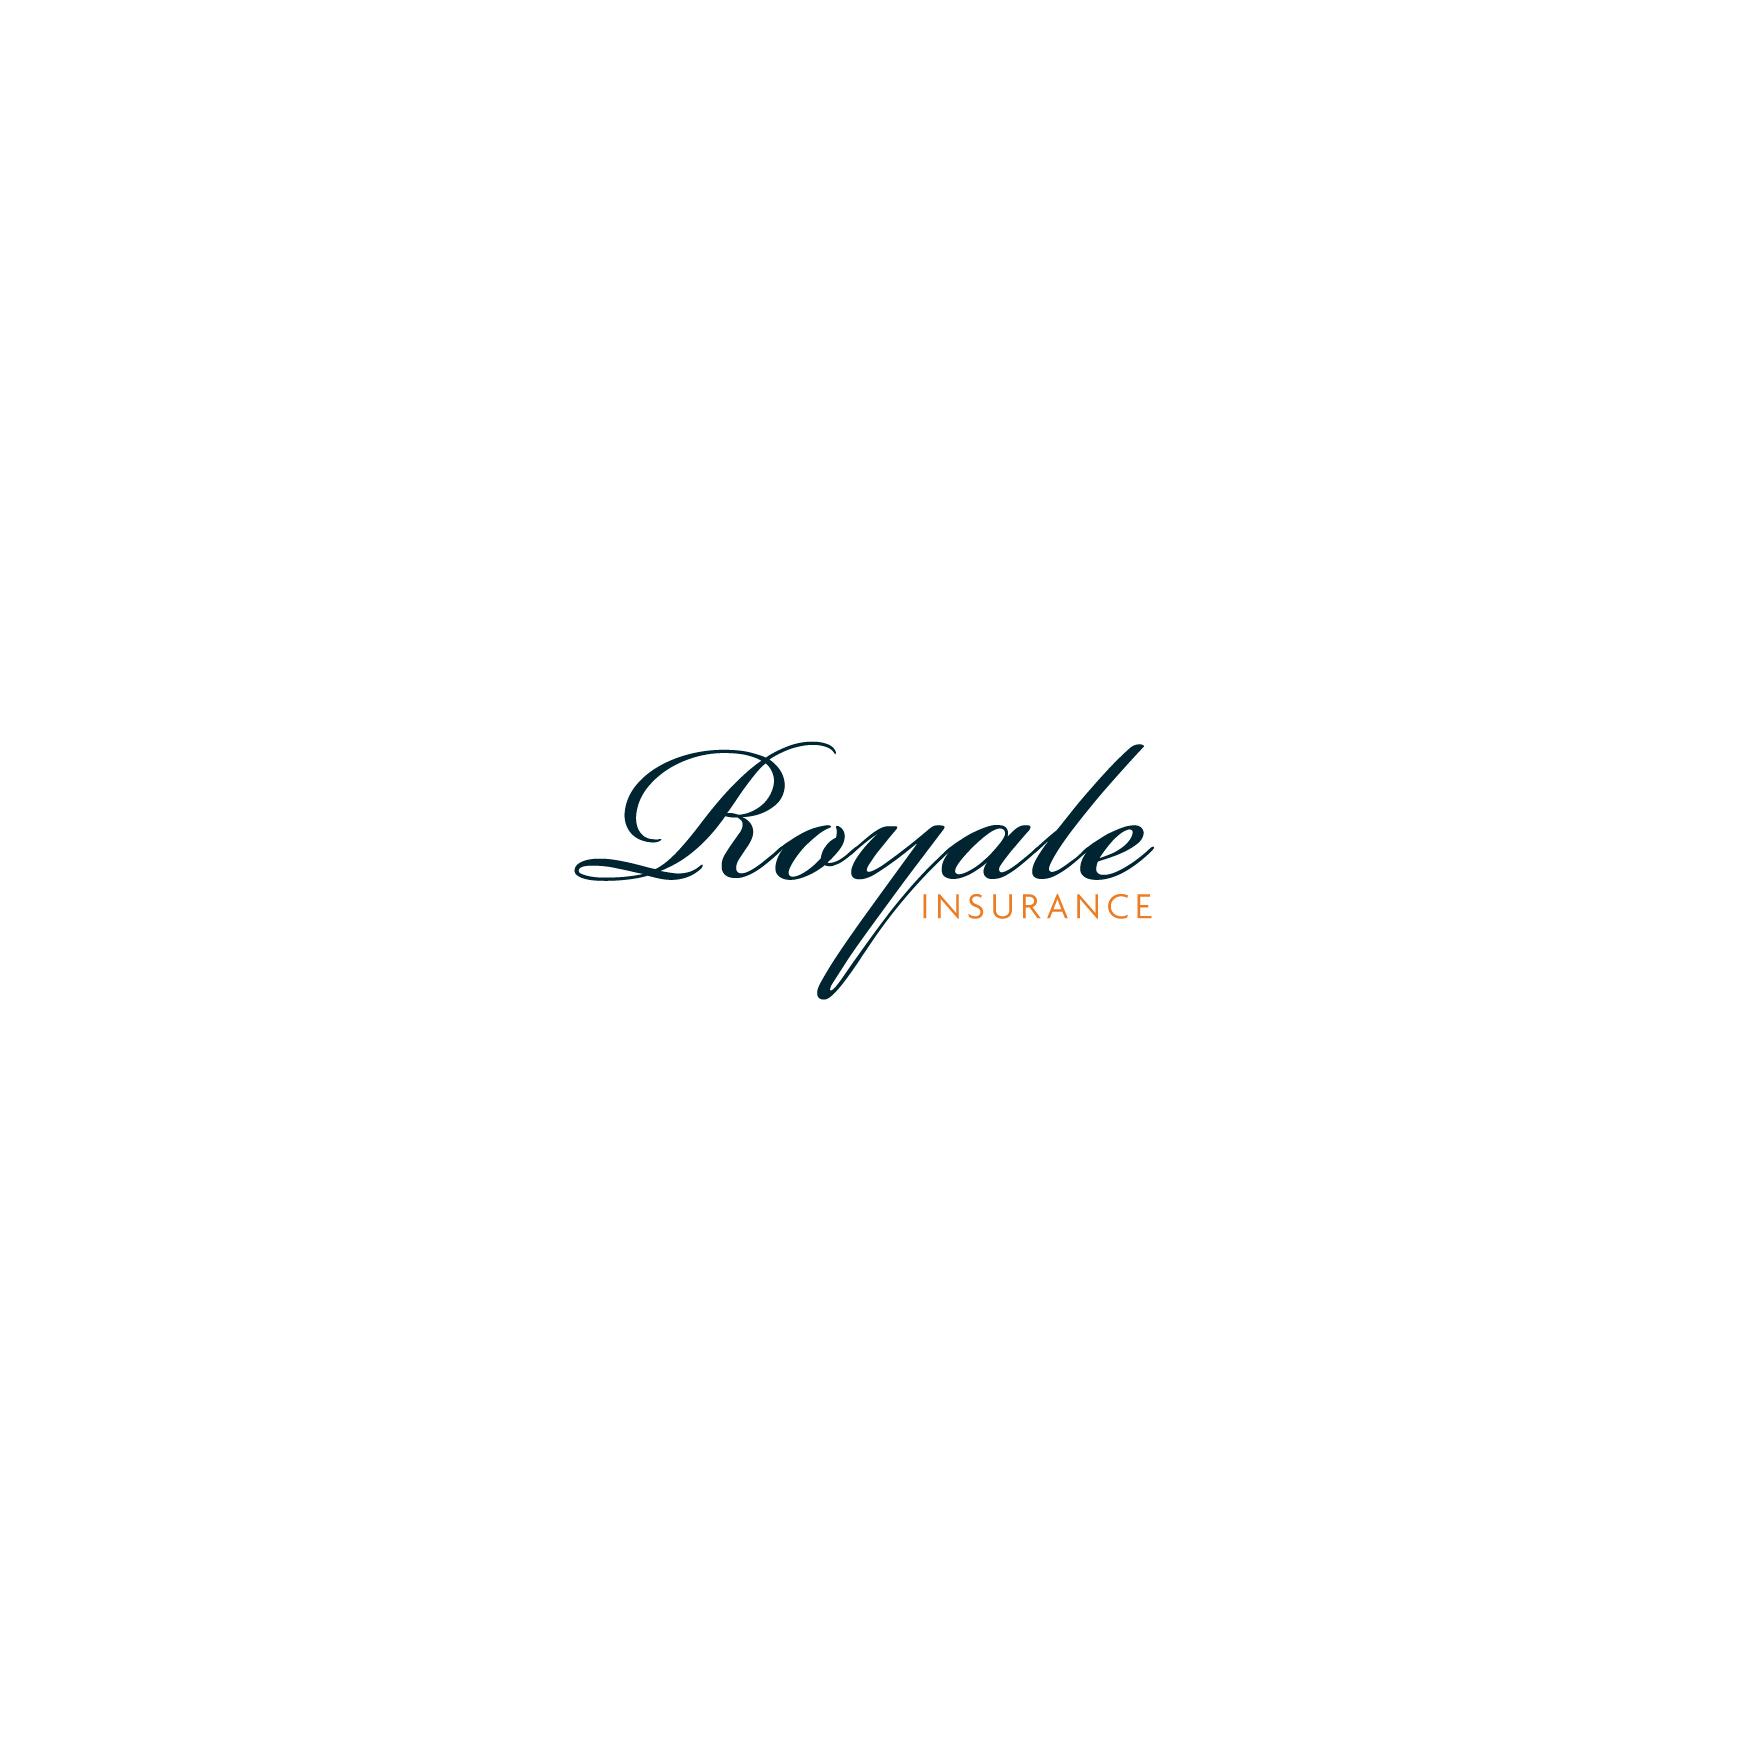 Royale Insurance